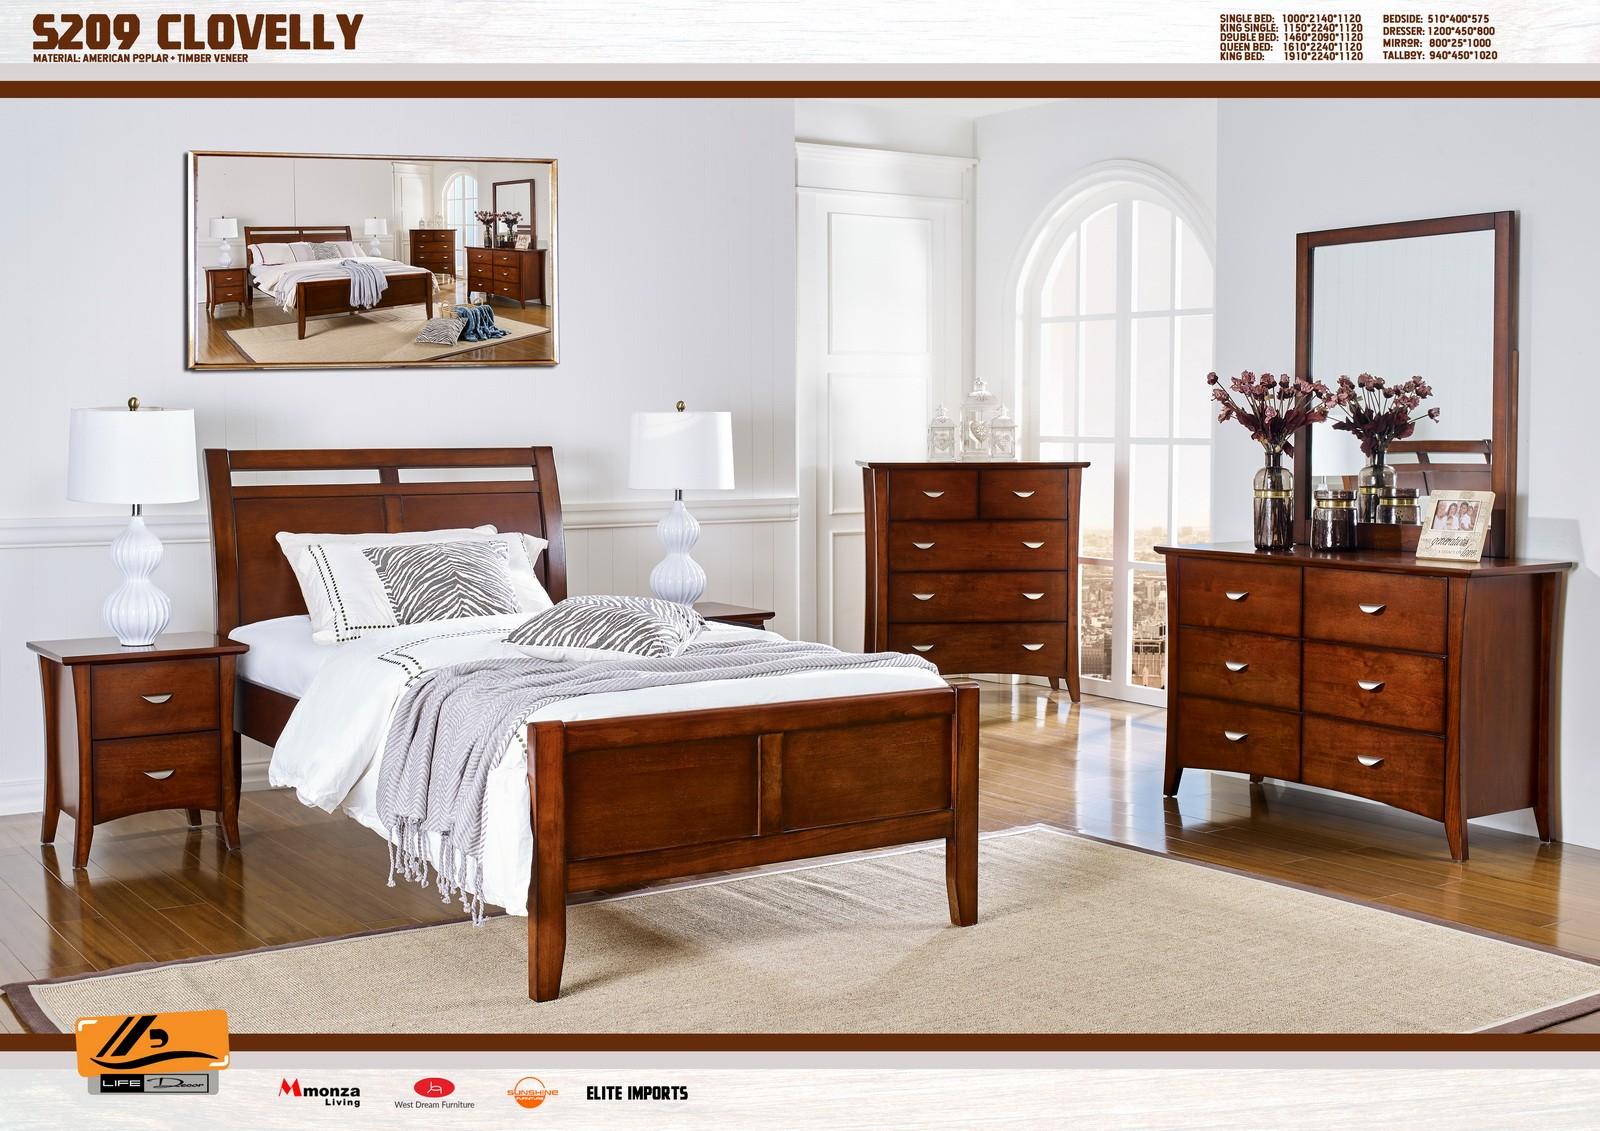 Clovelly Timber Bed Frame